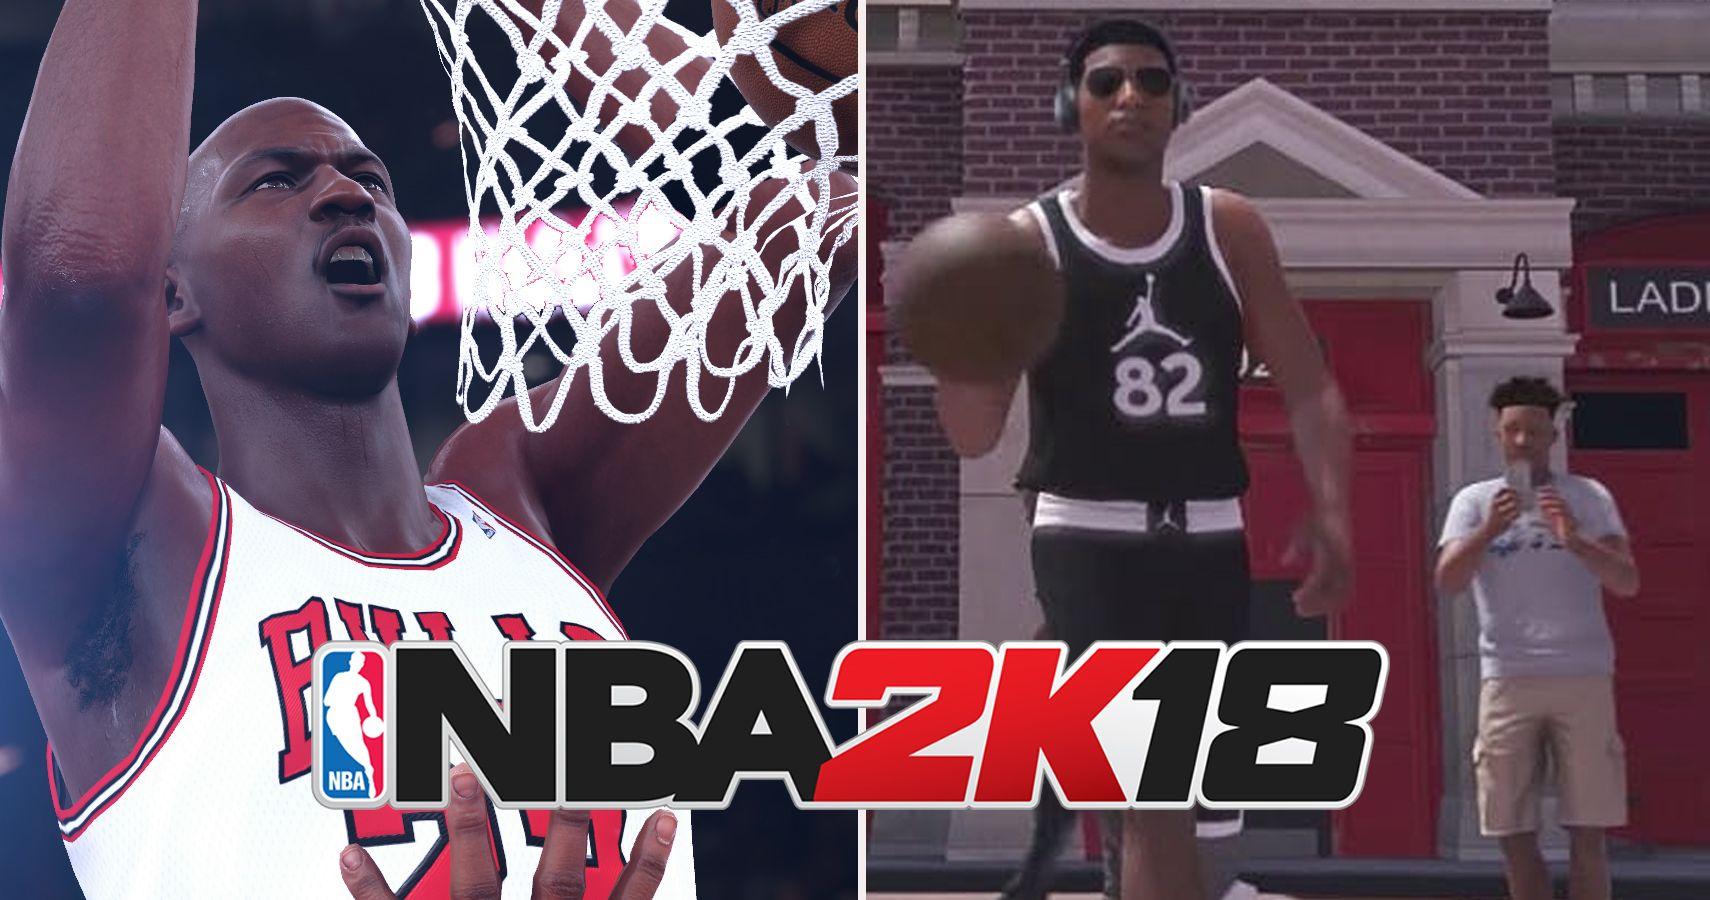 e17c1864248 25 Hidden Secrets You Still Haven t Found In NBA 2K18